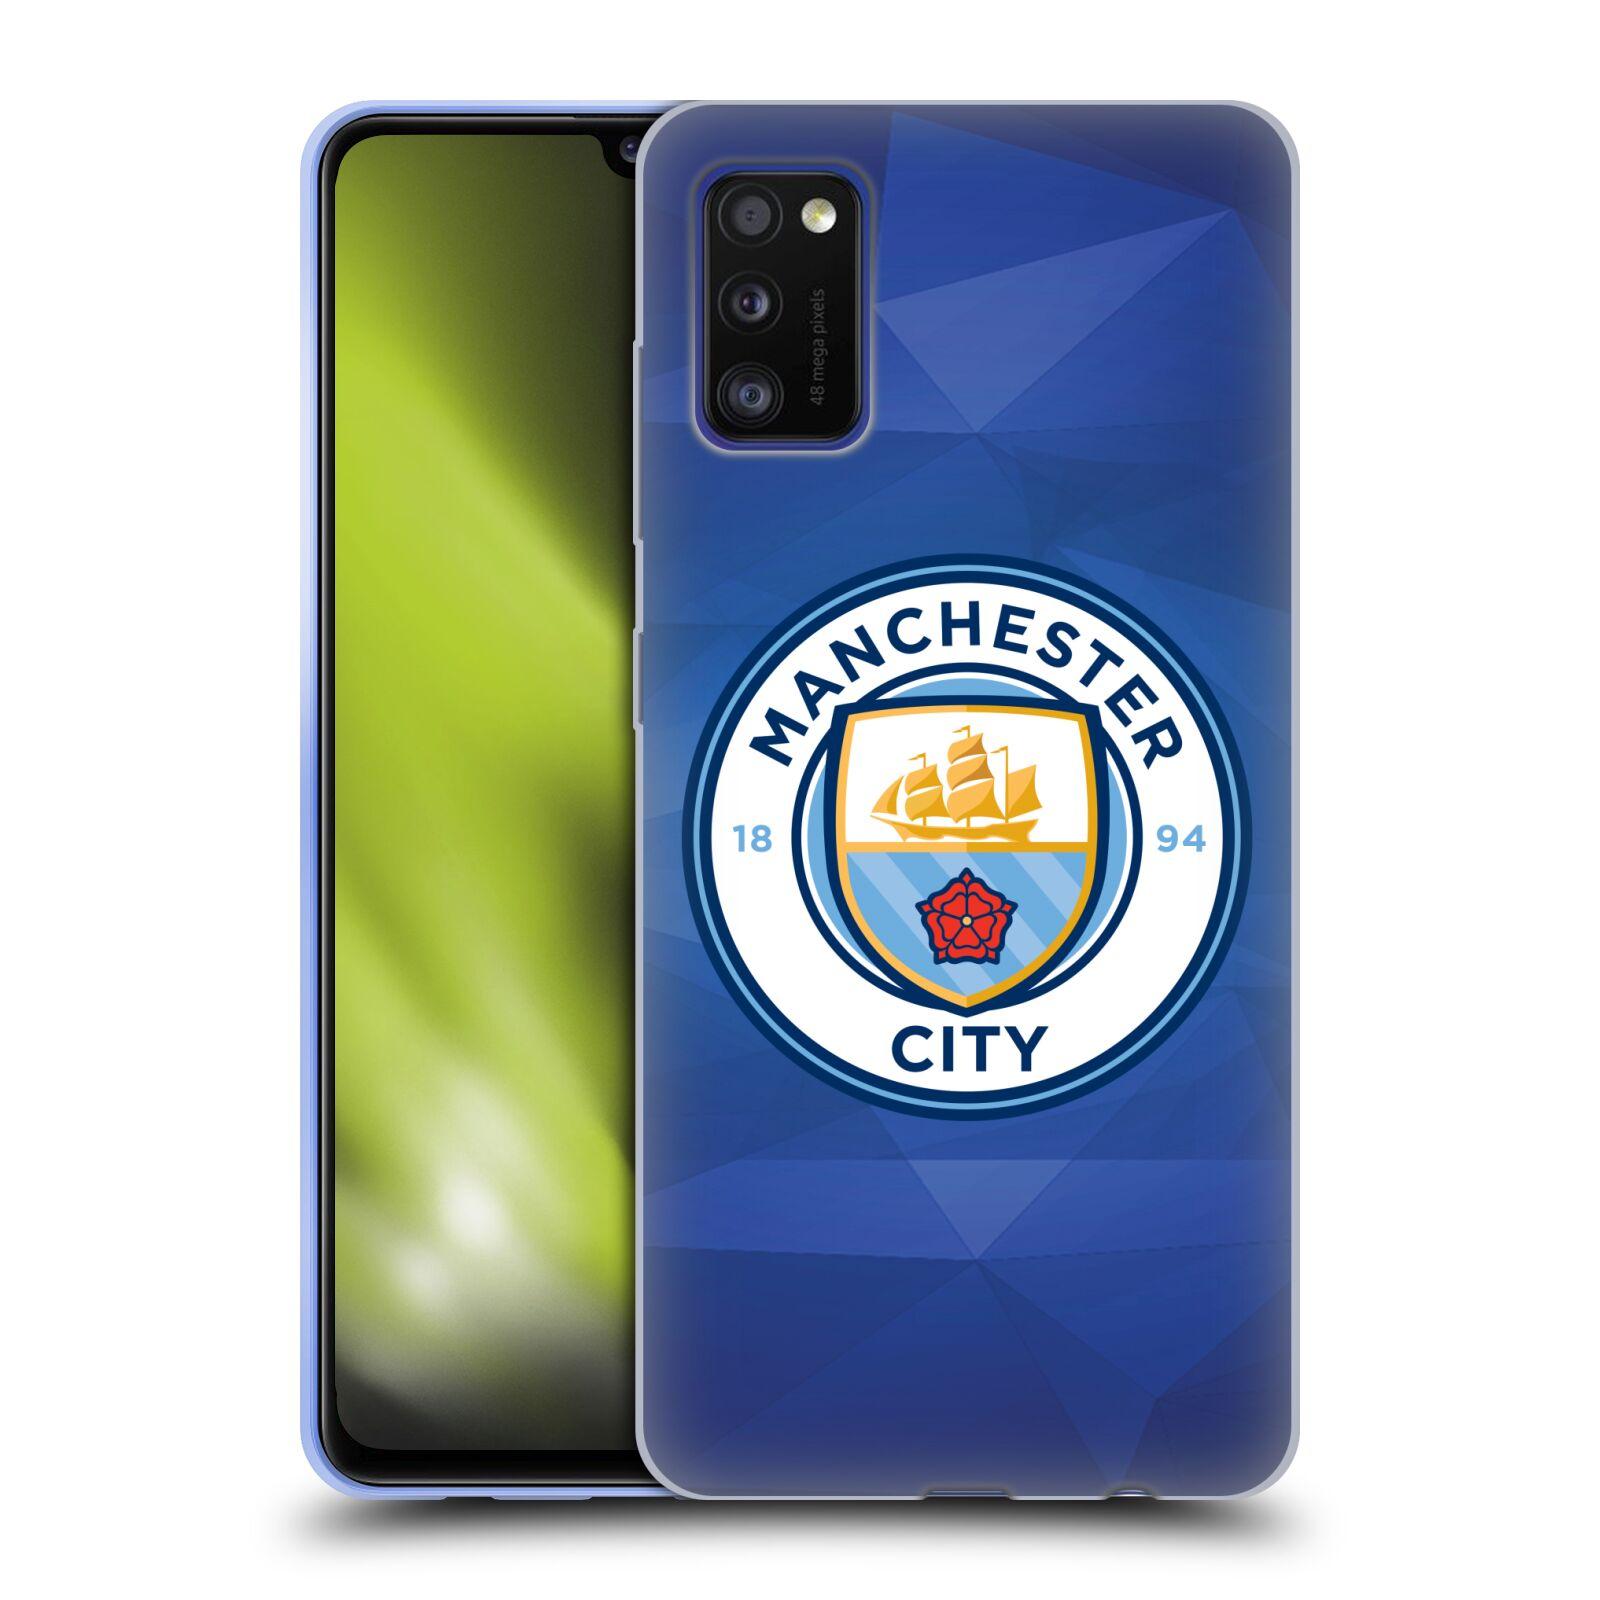 Silikonové pouzdro na mobil Samsung Galaxy A41 - Head Case - Manchester City FC - Modré nové logo